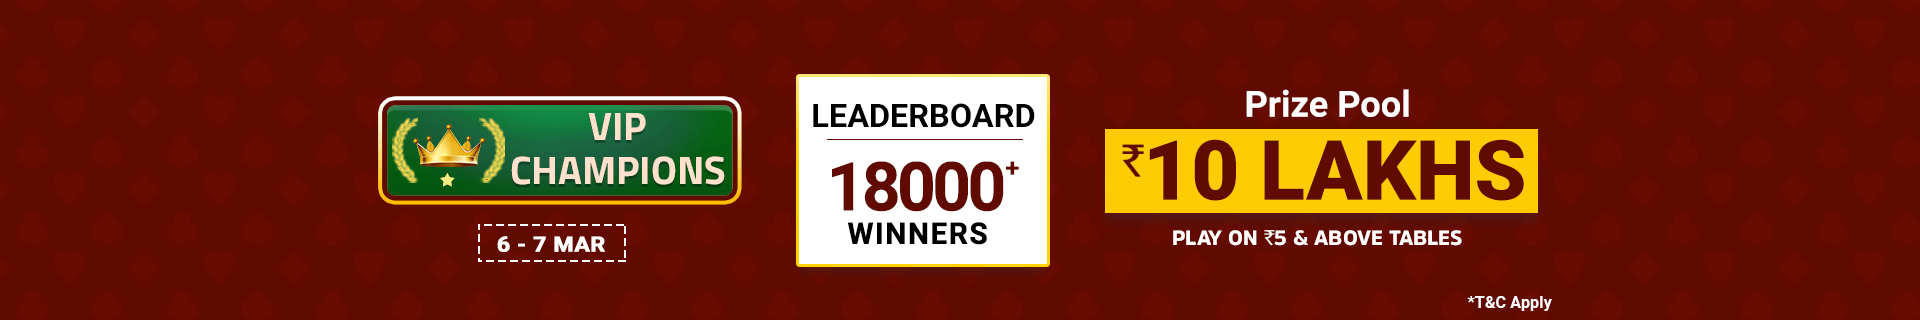 Vip League Leaderboard Contest